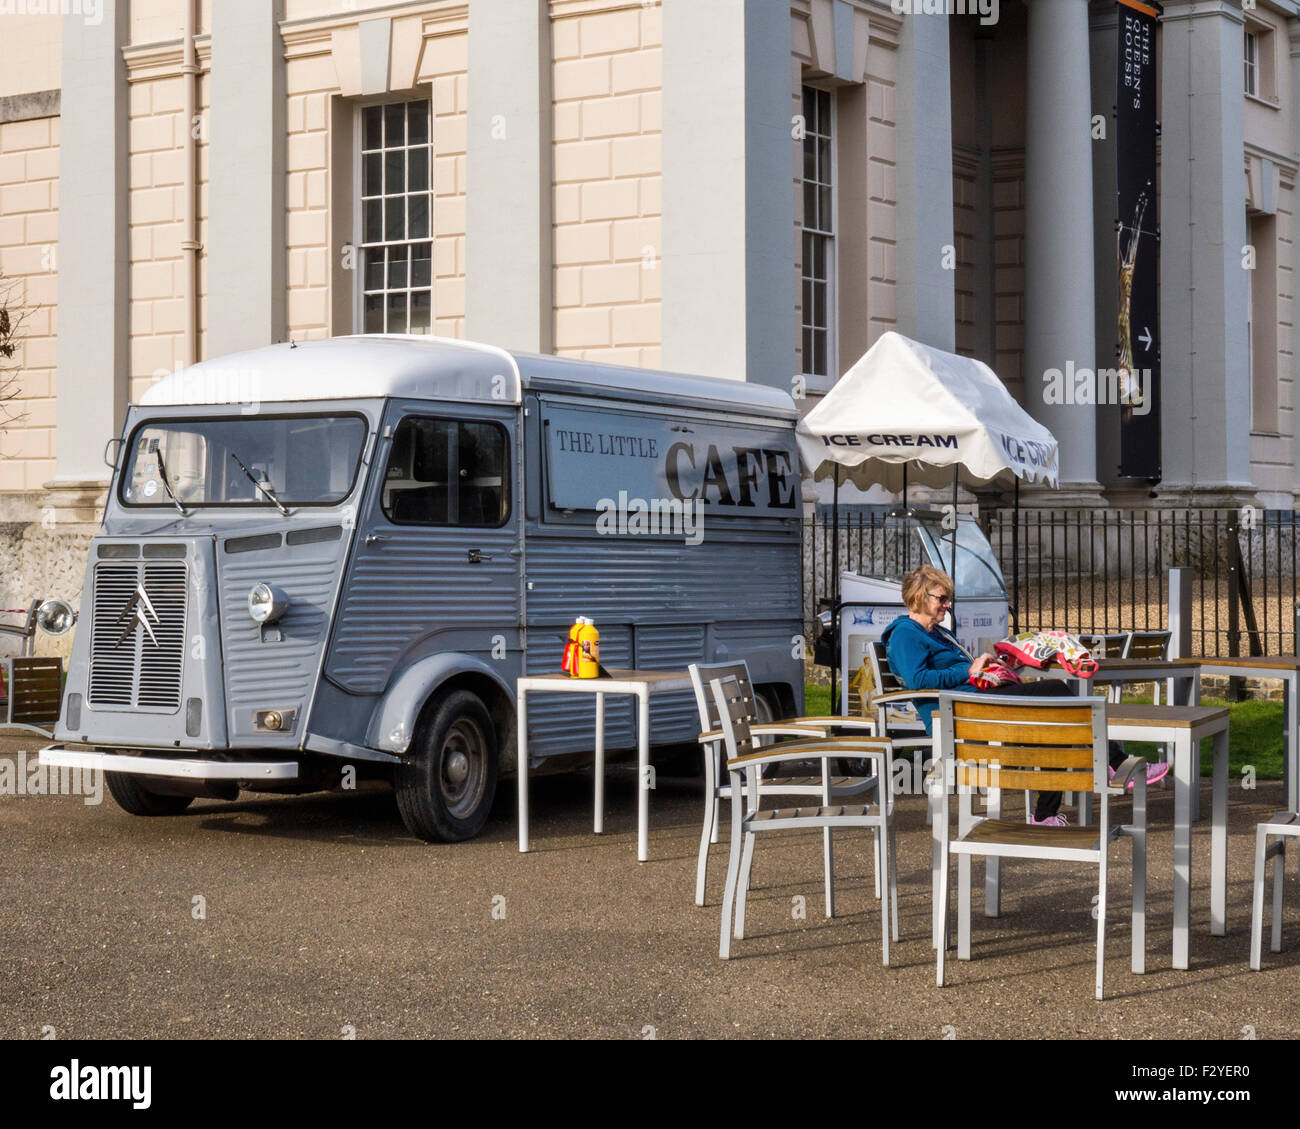 Royal Street Cafe Mobile